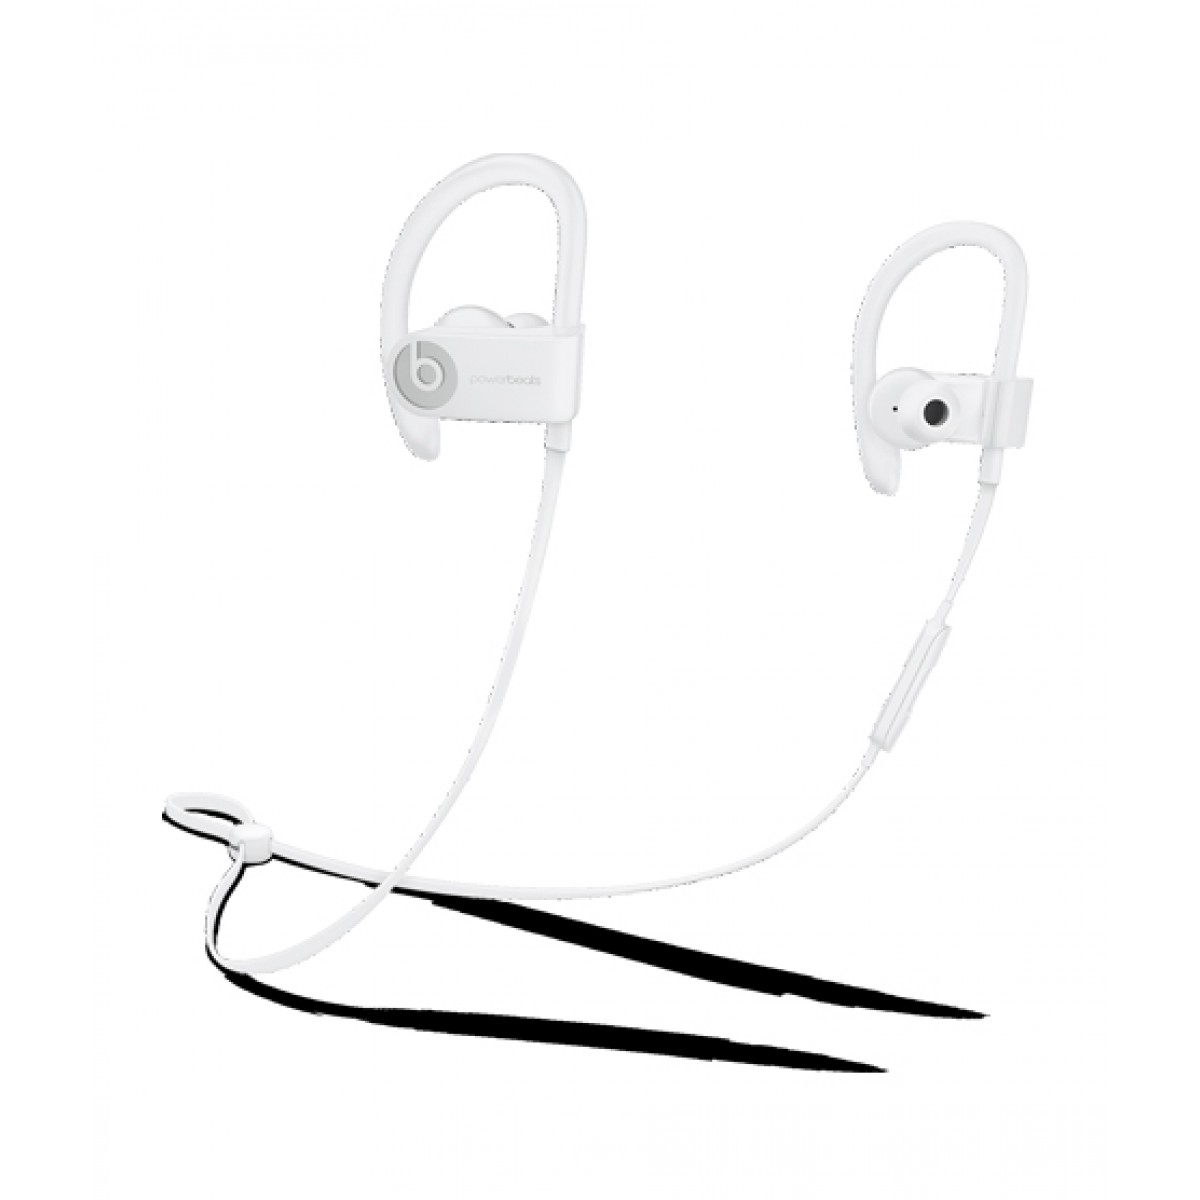 Beats Powerbeats3 Wireless Bluetooth Earphones White